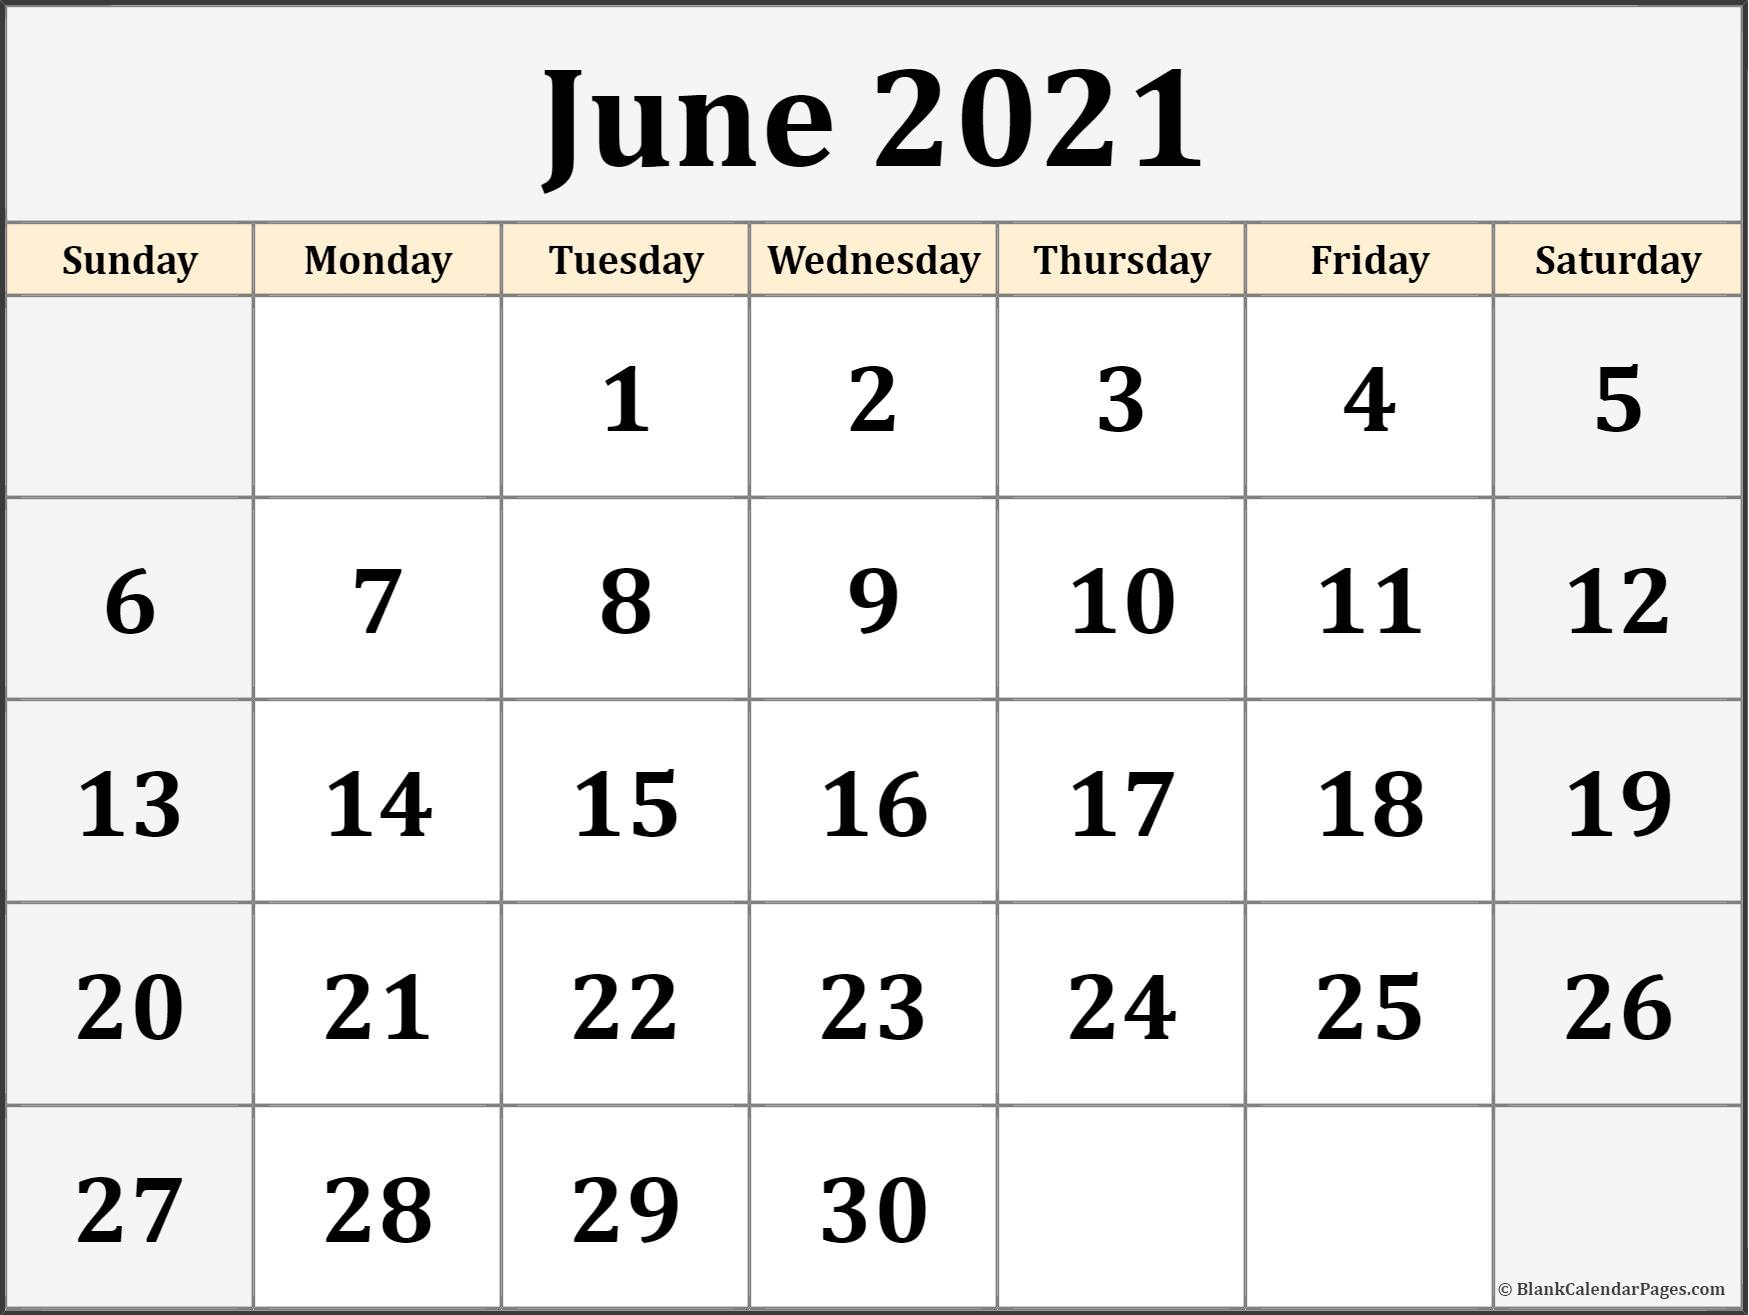 June 2021 Calendar Free Printable Monthly Calendars